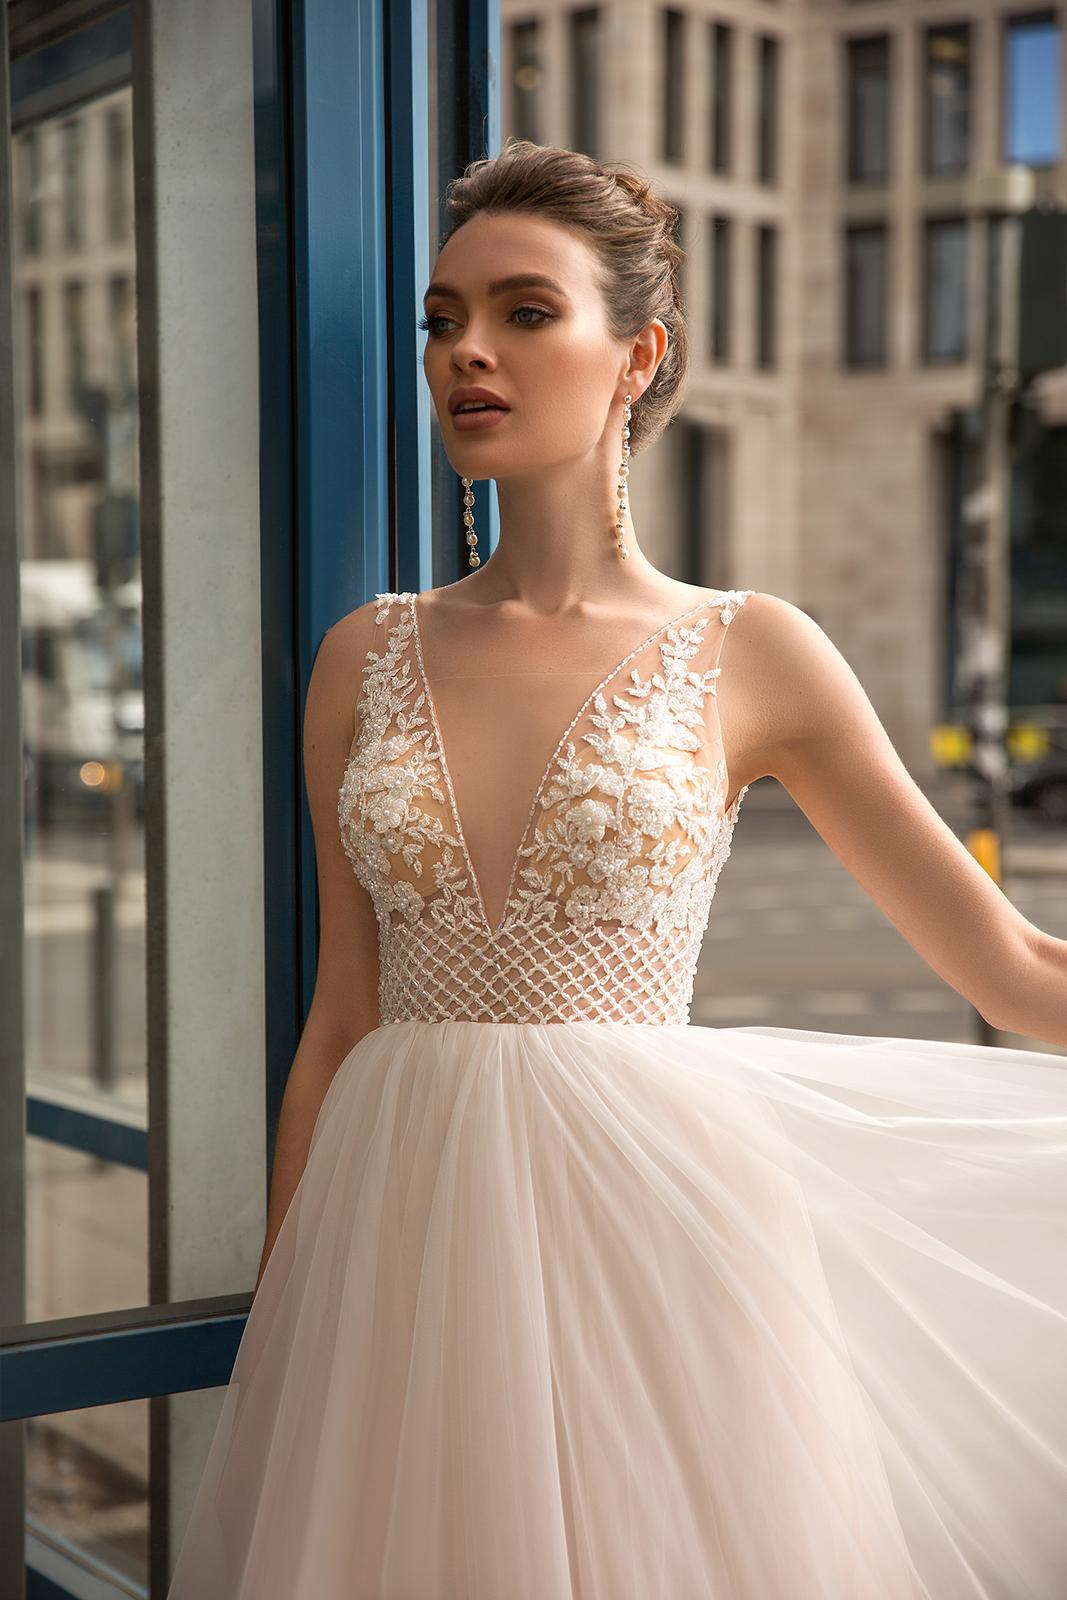 @aknajjanka Lehké, jednoduché šaty... - Obrázek č. 4